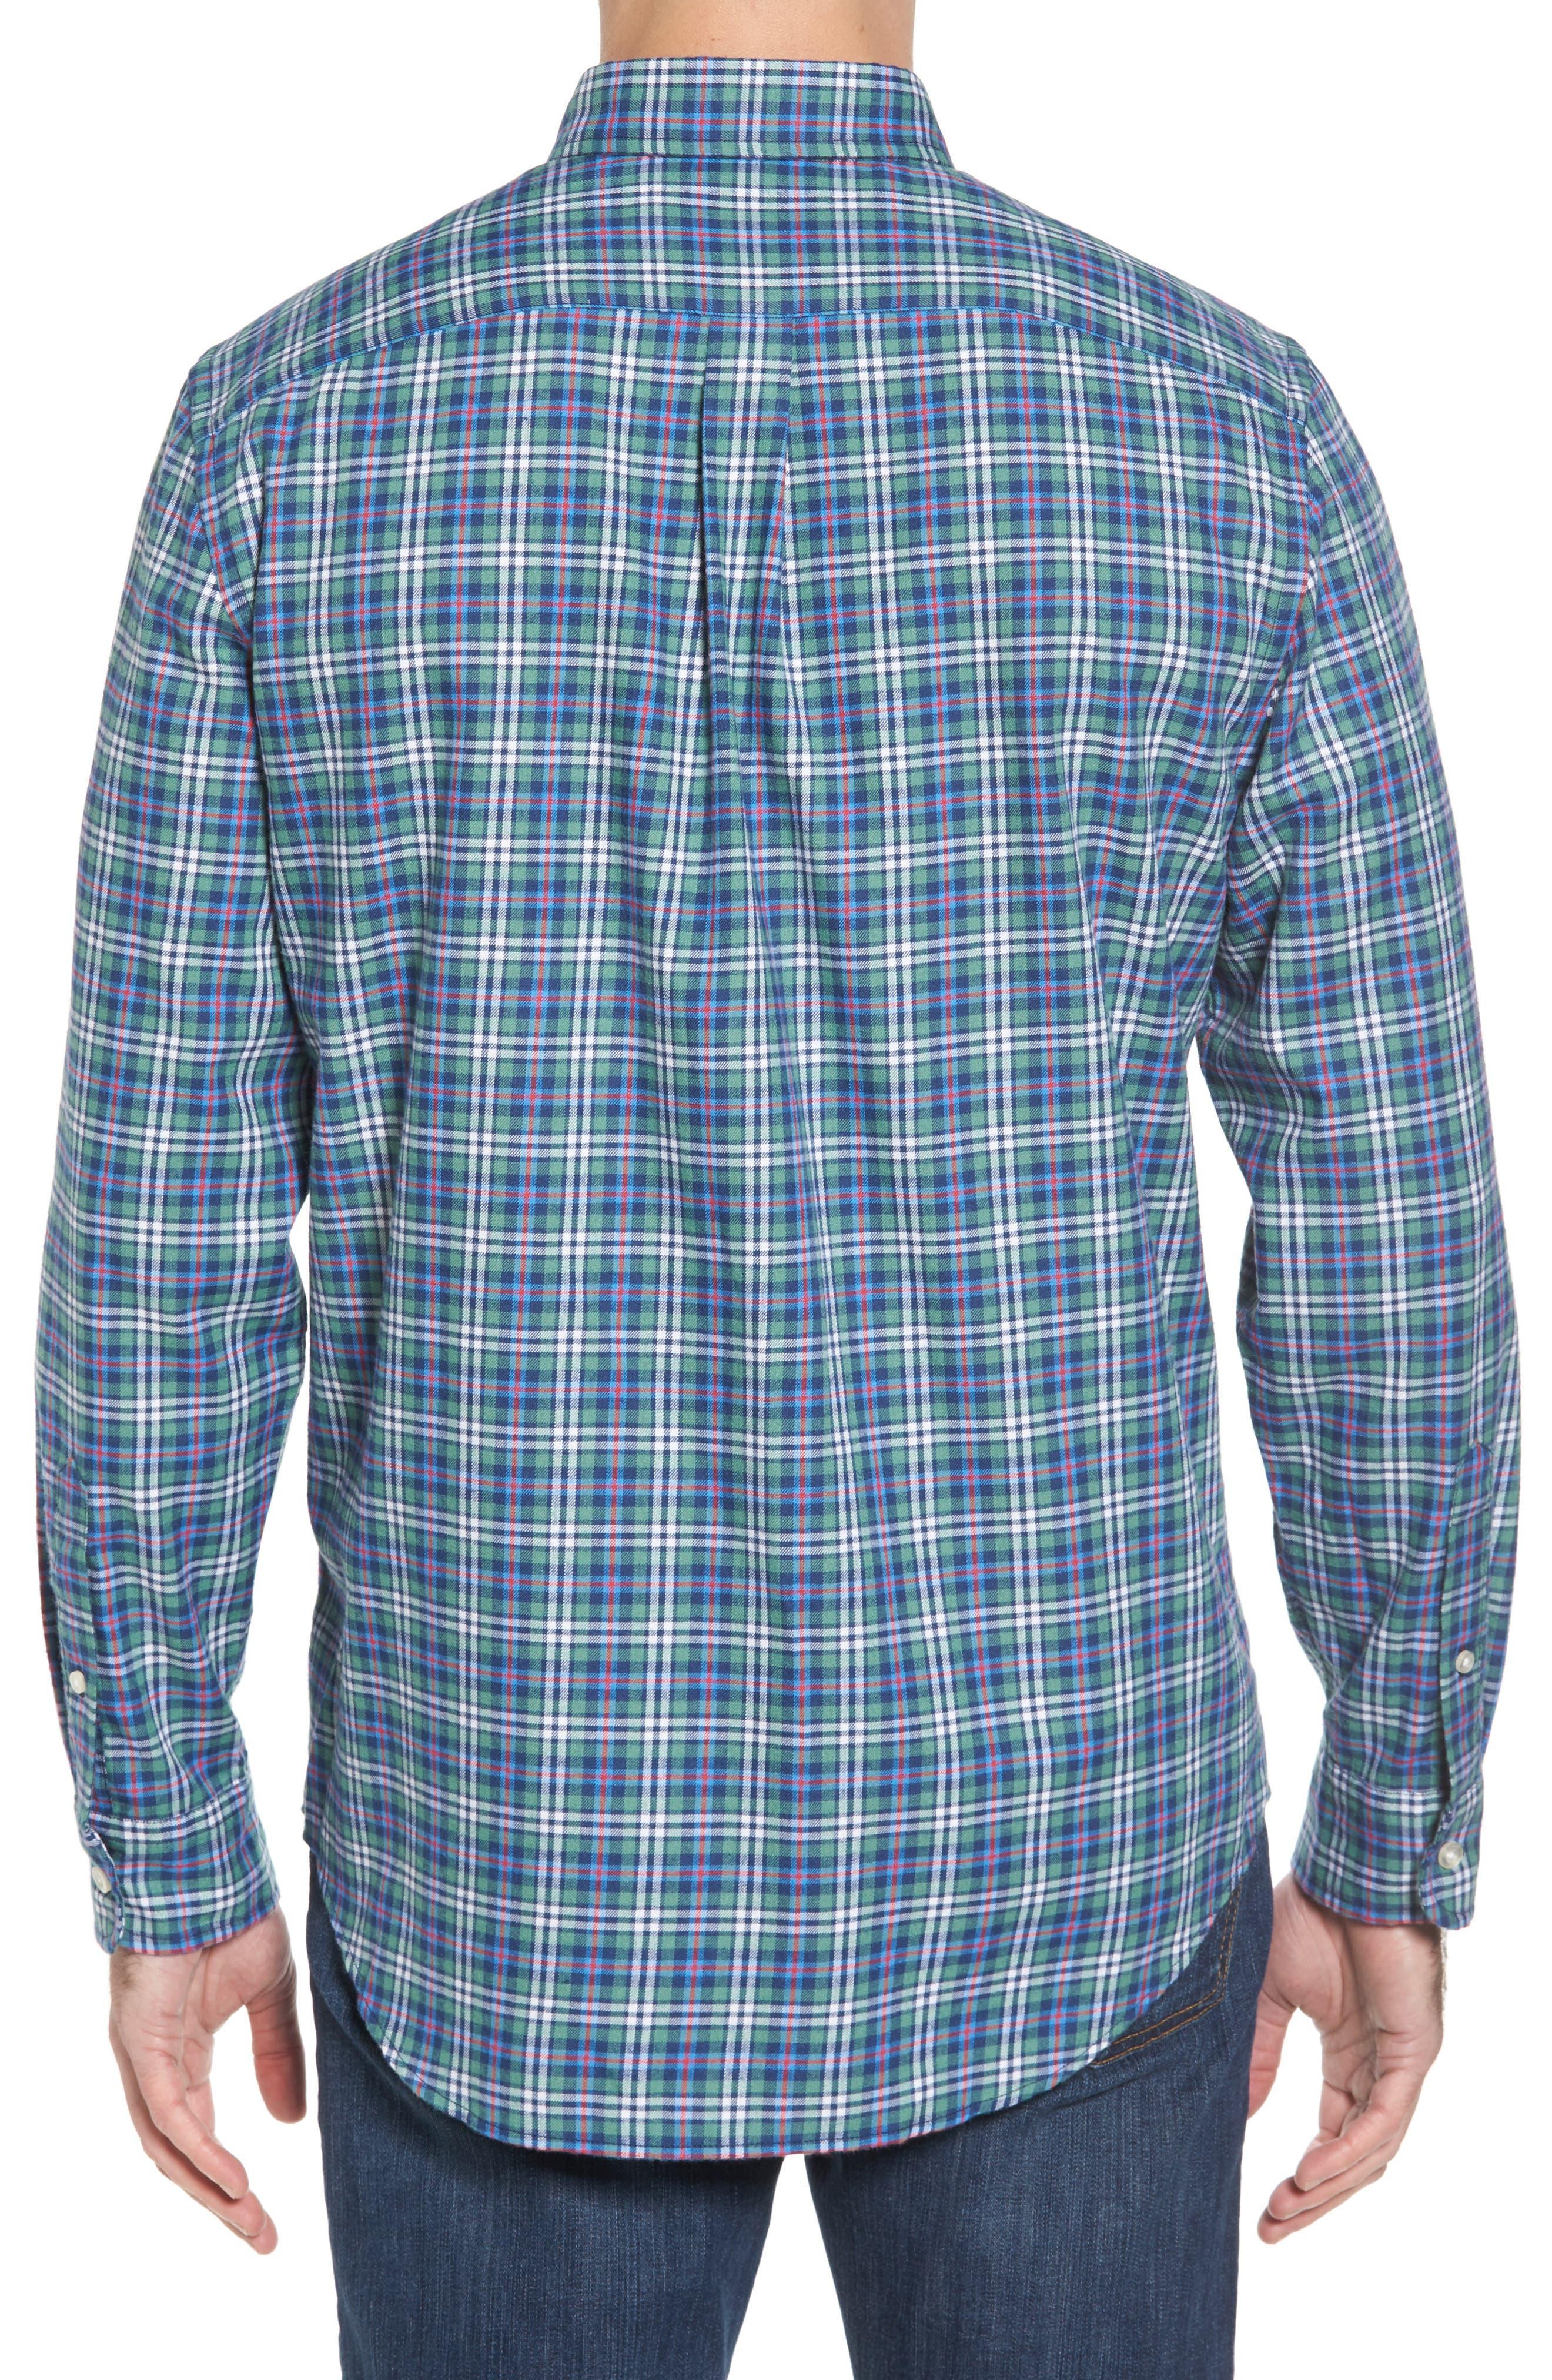 Murray Plaid Classic Fit Sport Shirt,                             Alternate thumbnail 2, color,                             303